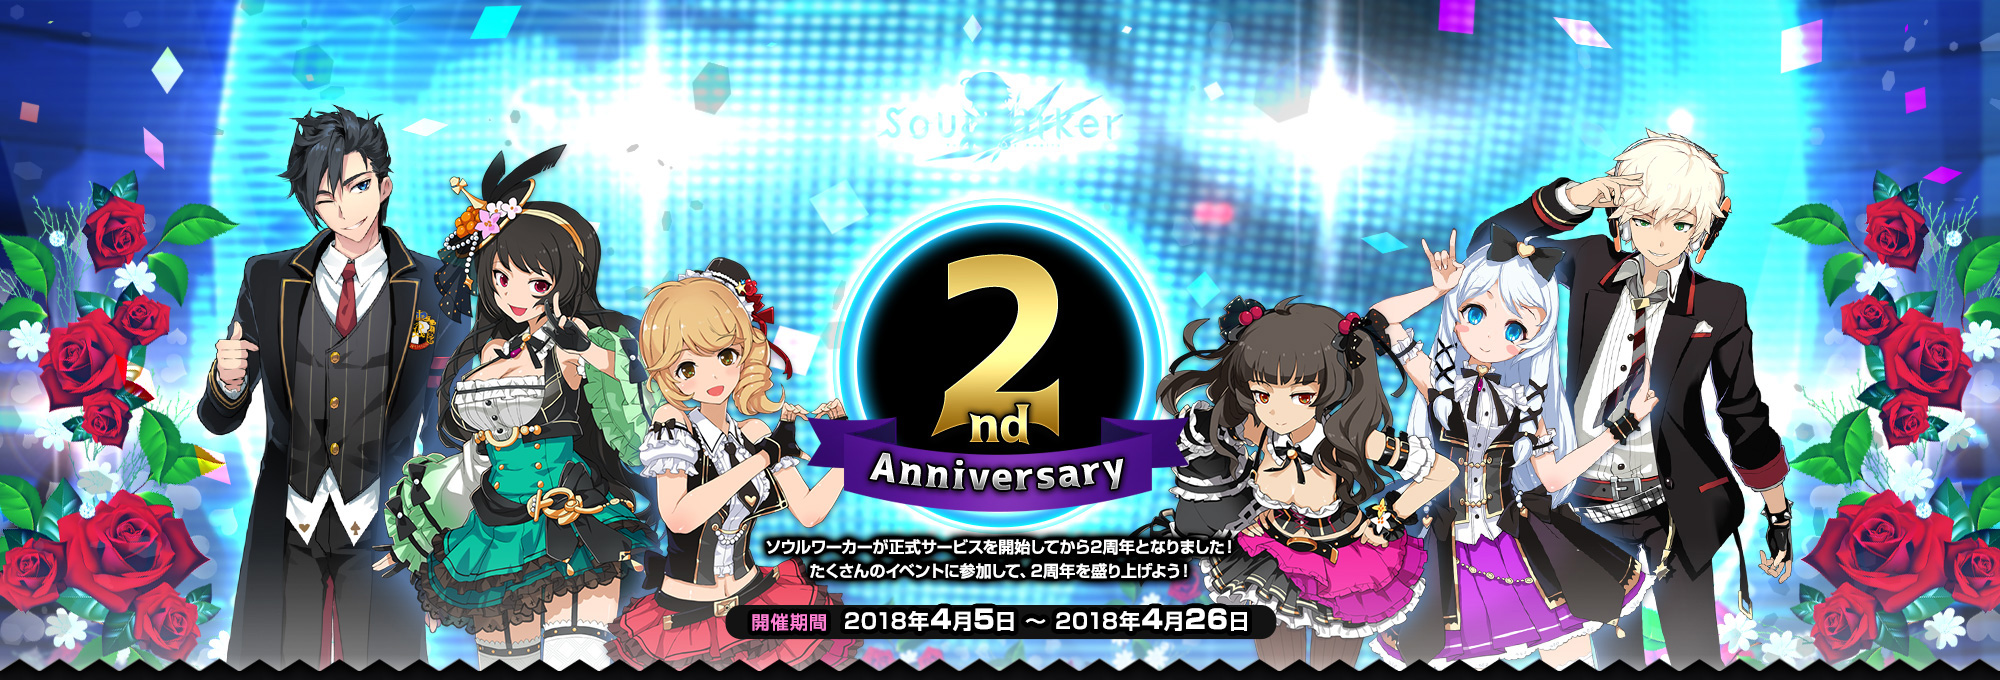 [Image: 0-1_Banner_2nd_Anniversary_Celebration.jpg]